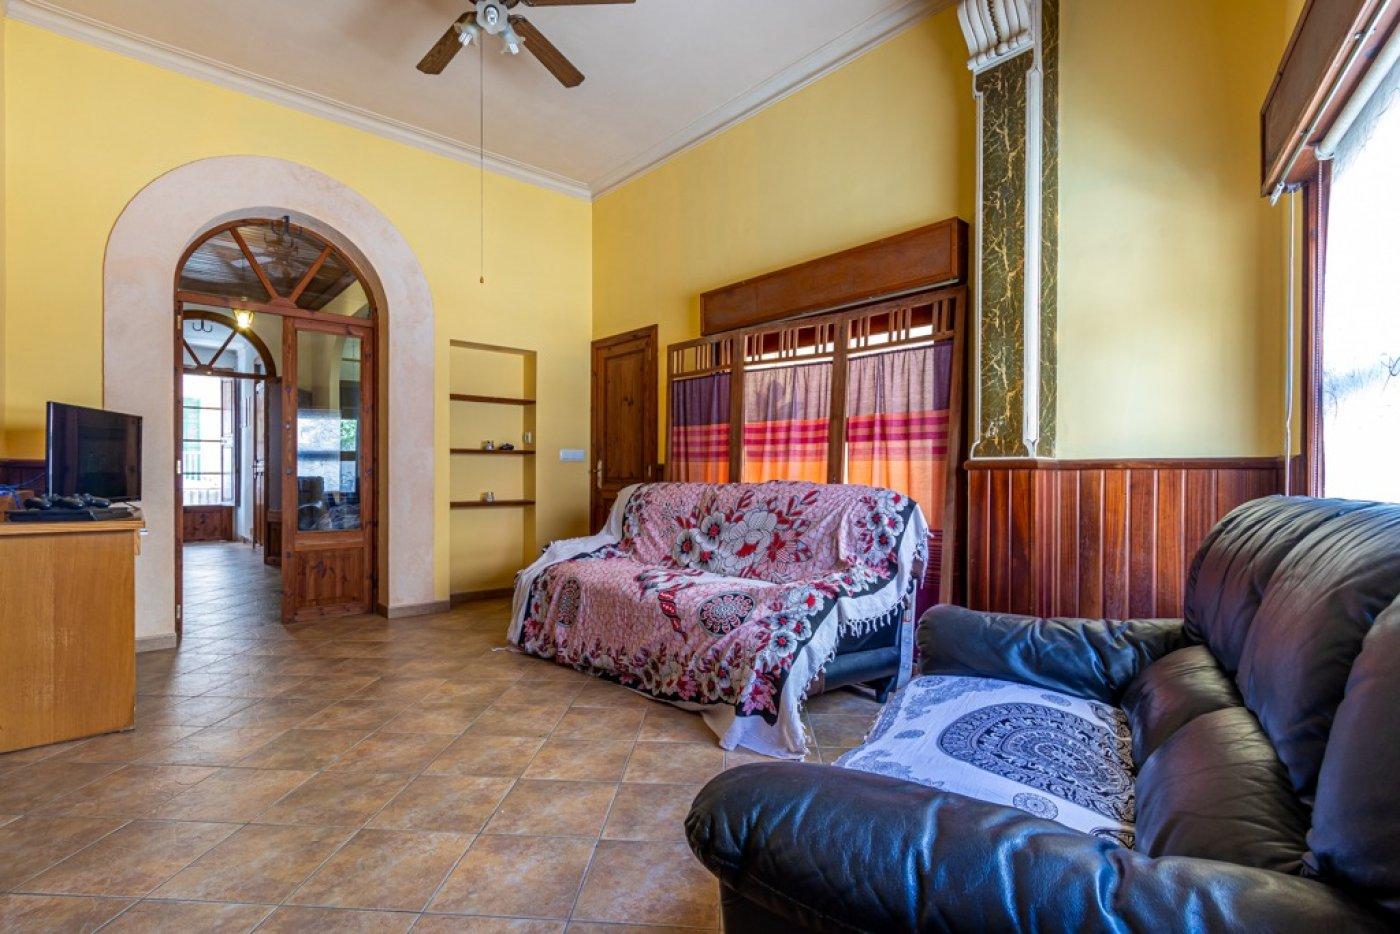 Ground Floor Apartment for sale in ARENAL - LLUCMAJOR, Llucmajor